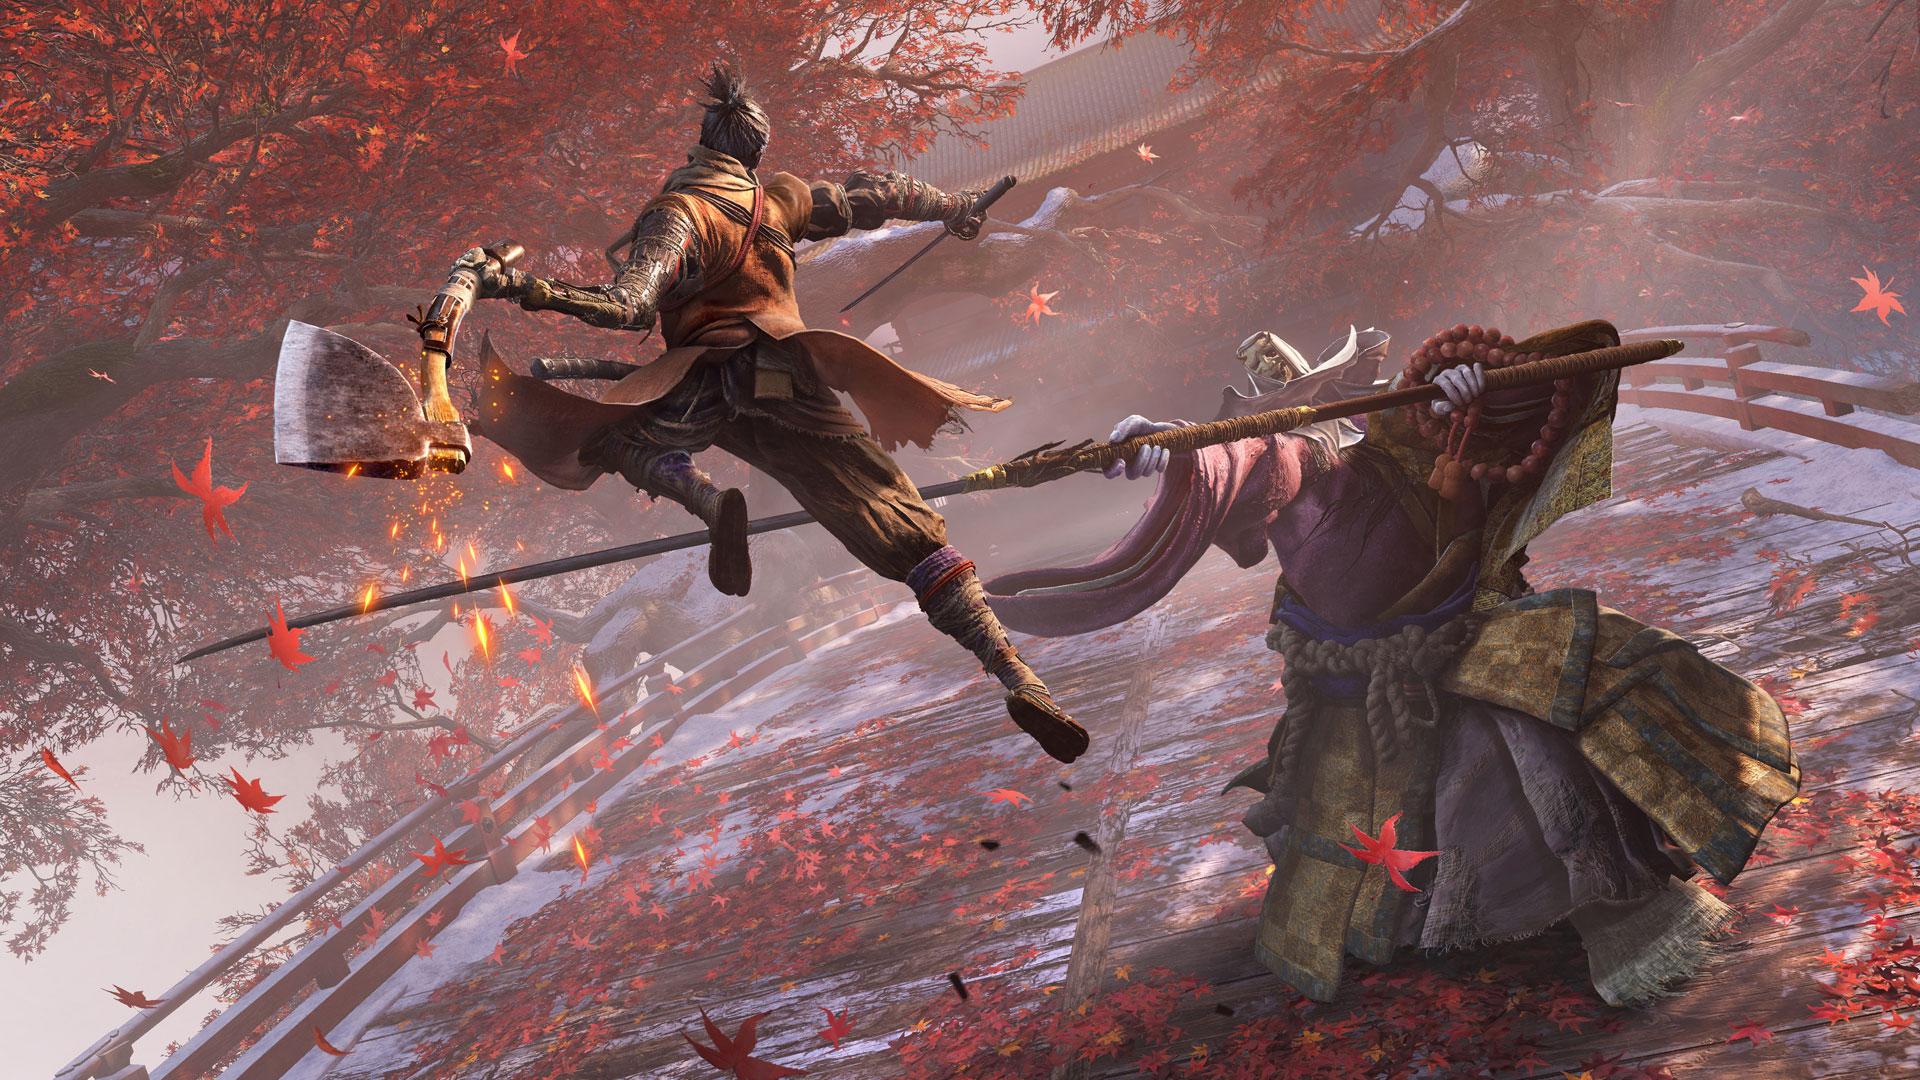 Today's Best Game Deals: Sekiro: Shadows Die Twice $45, Mortal Kombat 11 $50, more